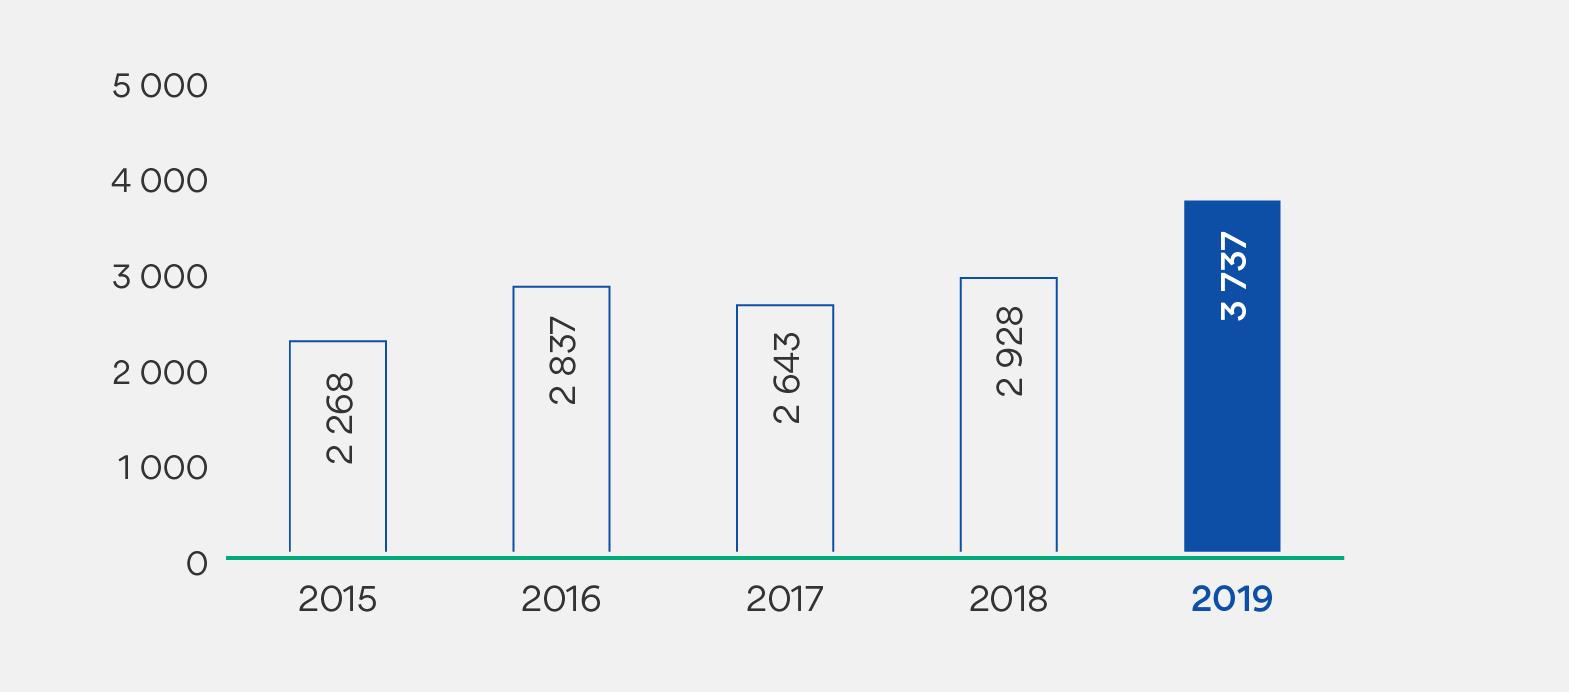 Resultat før skatt i millioner kroner. 2015: 2268. 2016: 2837. 2017: 2643. 2018: 2928. 2019: 3737.